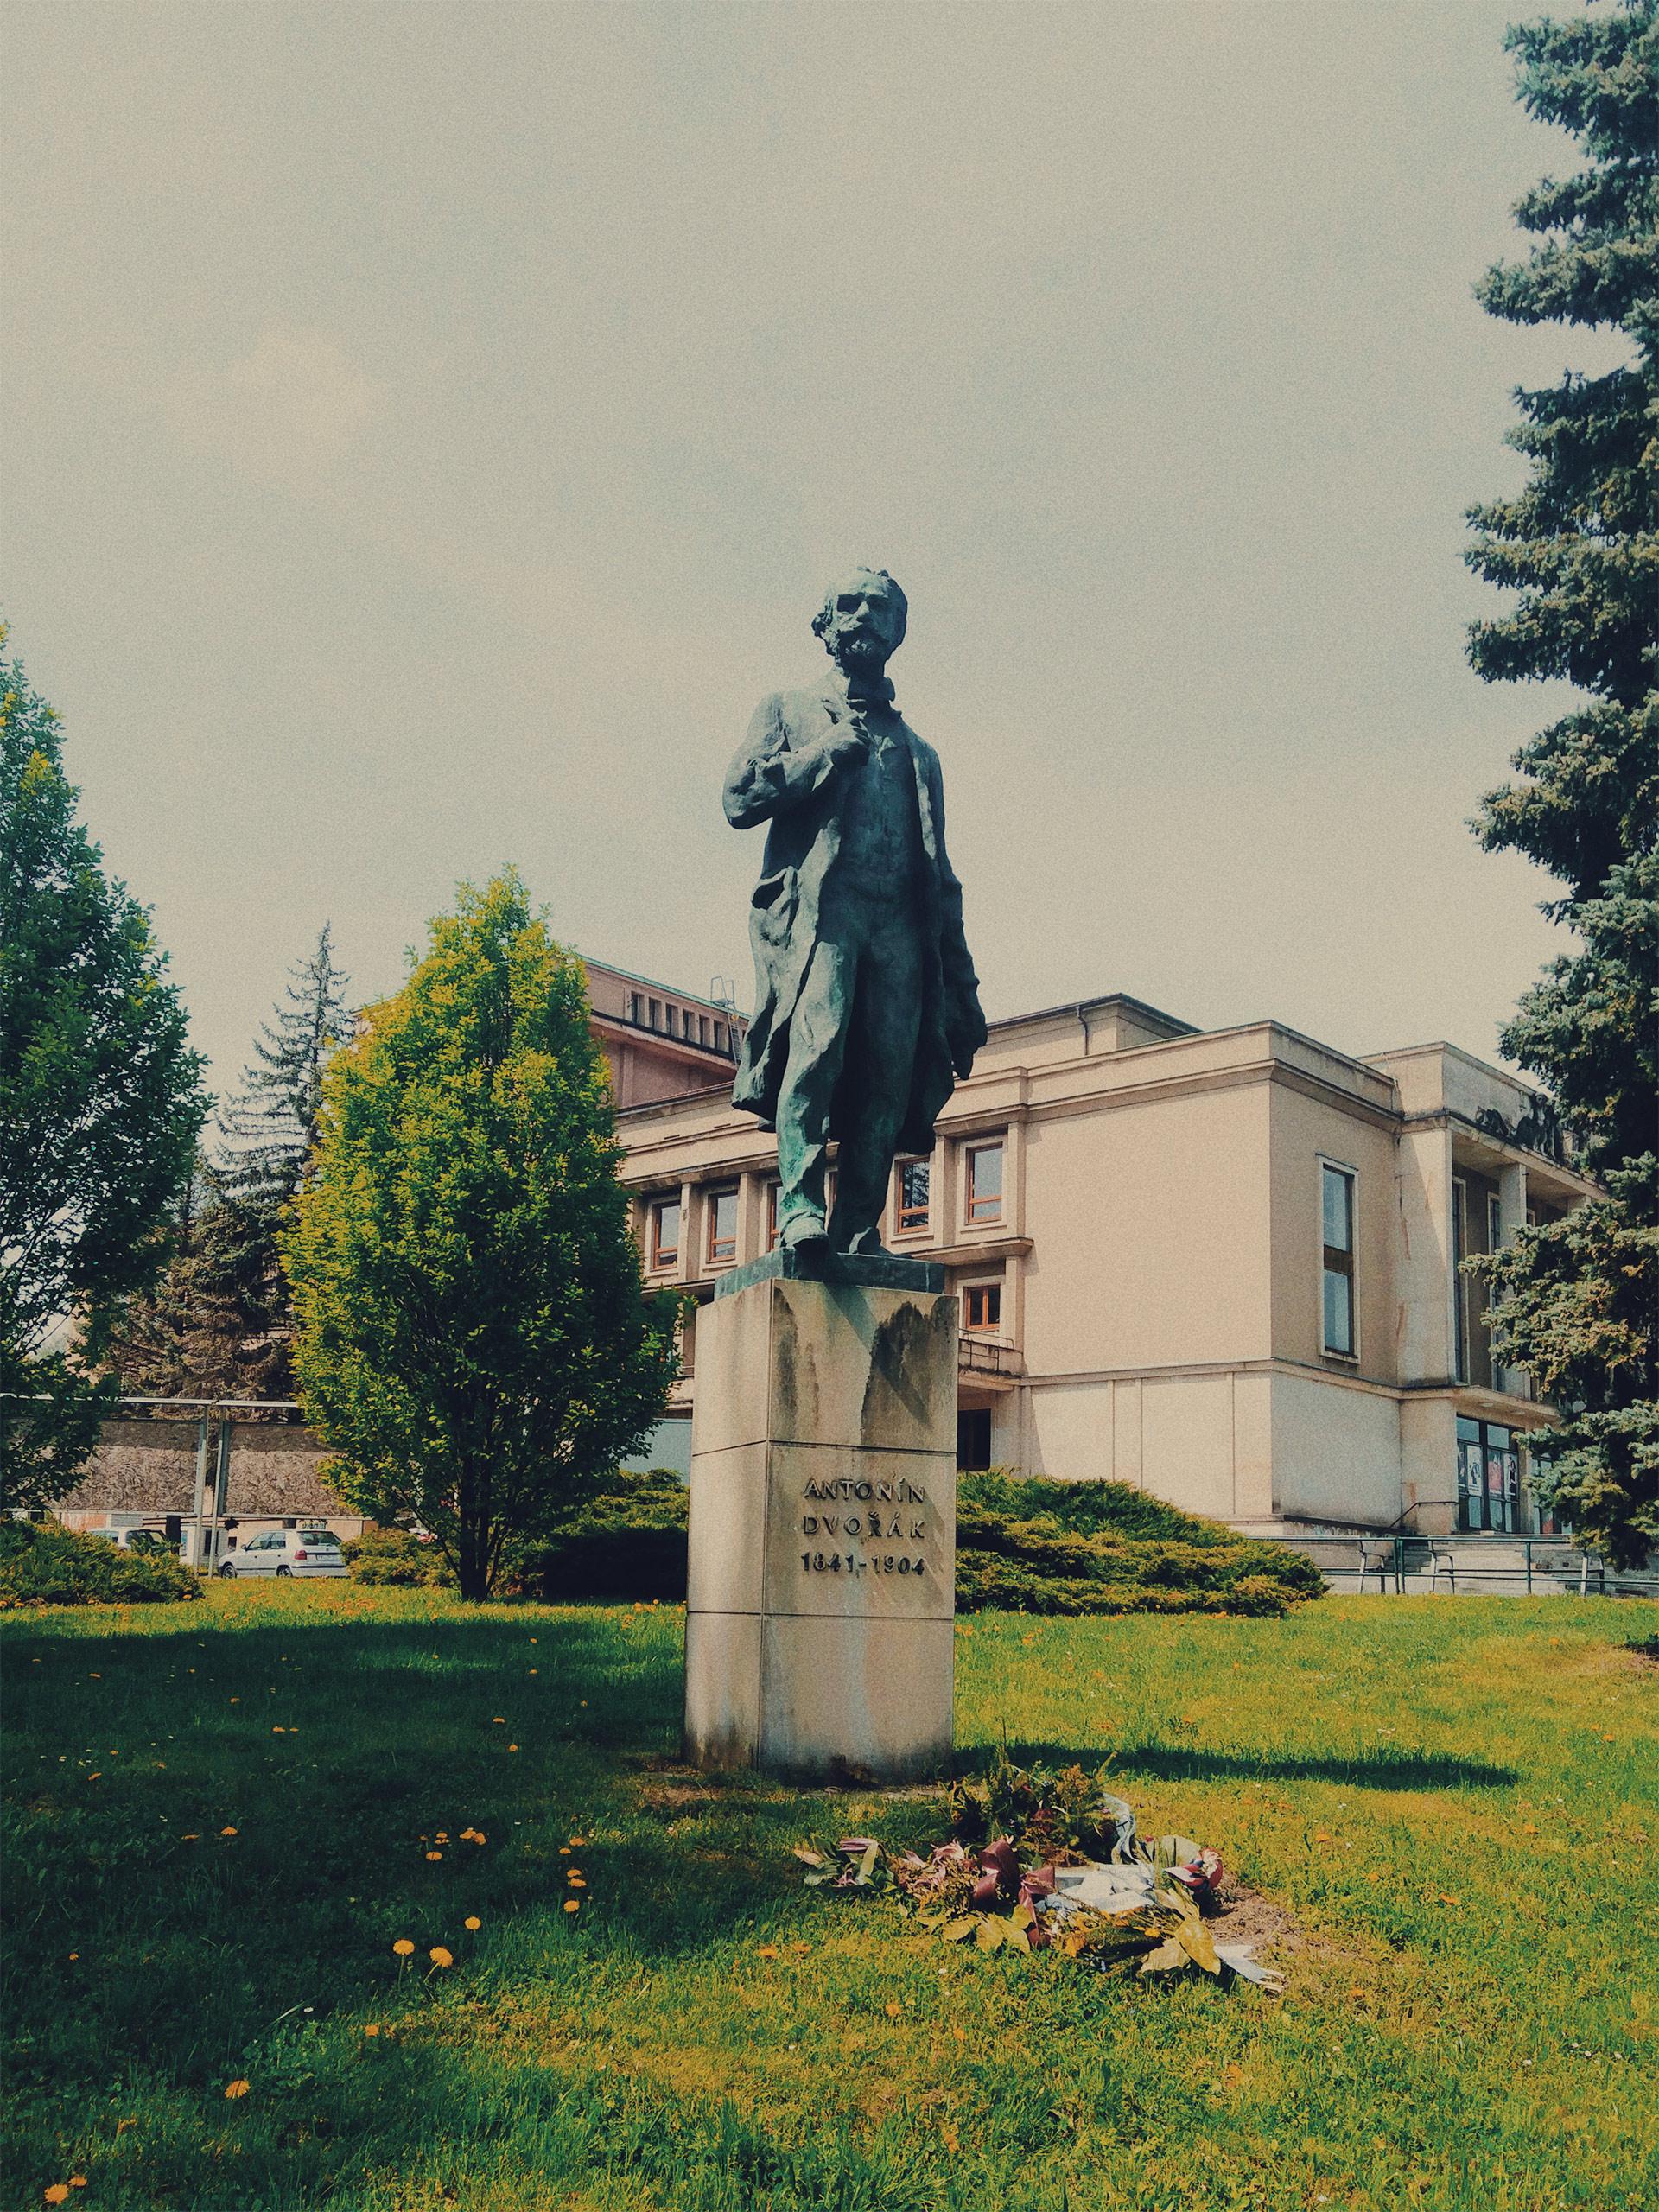 Příbramské sochy - obrázek 1236